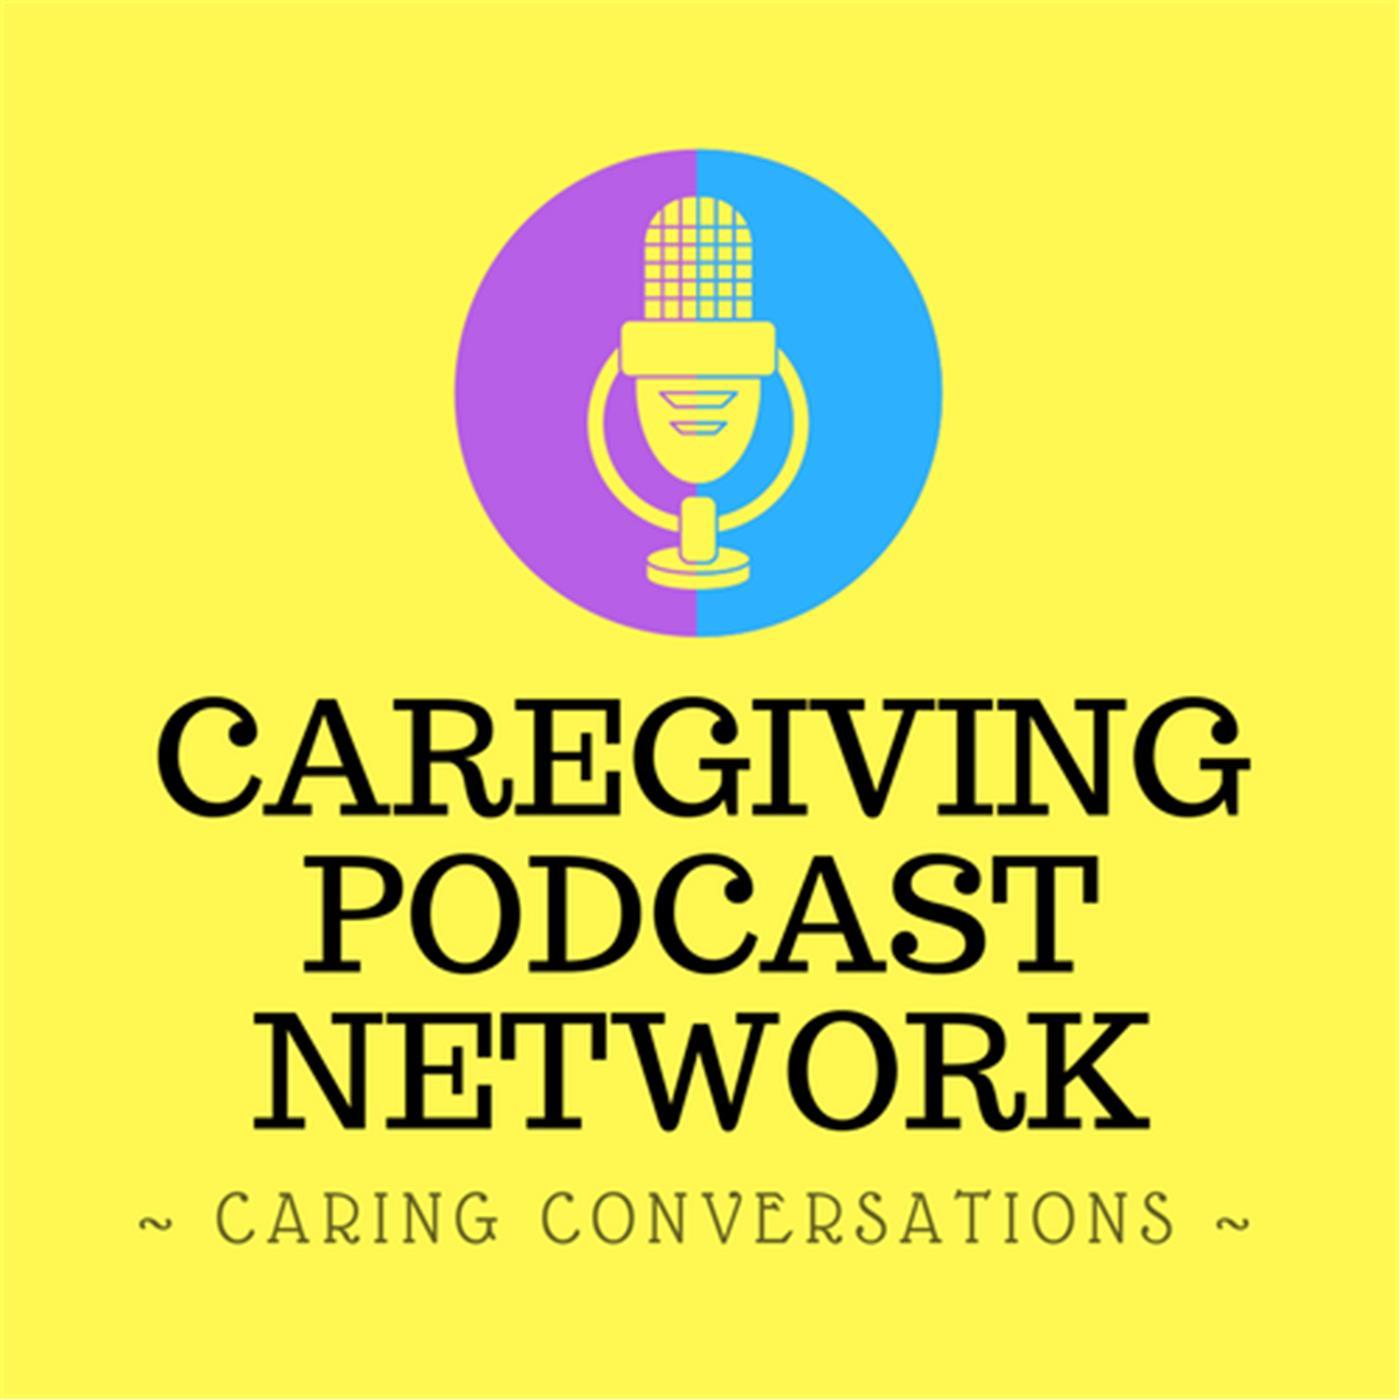 Caregiving Podcast Network